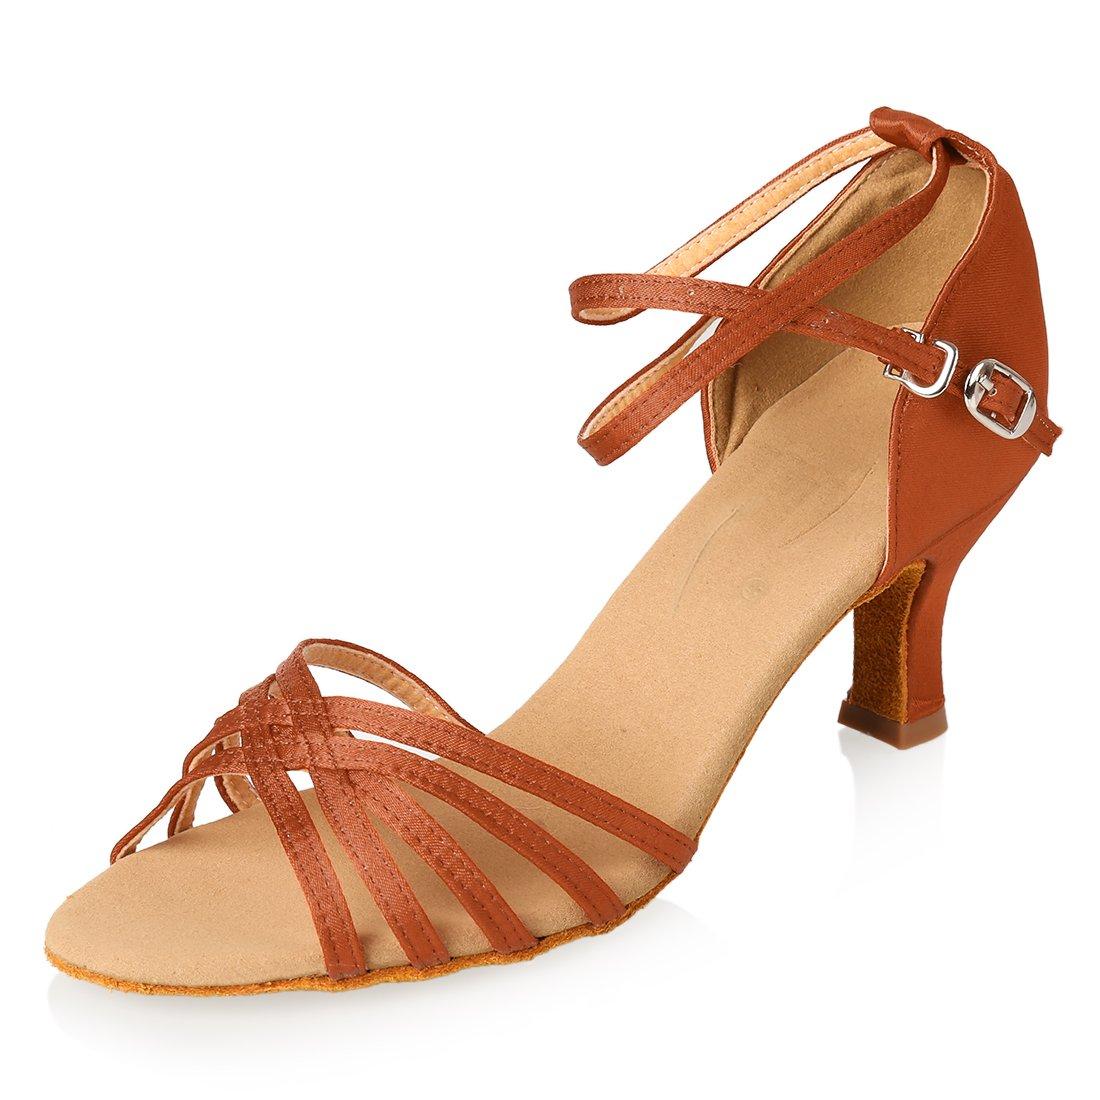 APTRO Damen Schuhe Tanzschuhe Ballsaal Latin Tanzen Silber Sandalen  38 EU|Braun